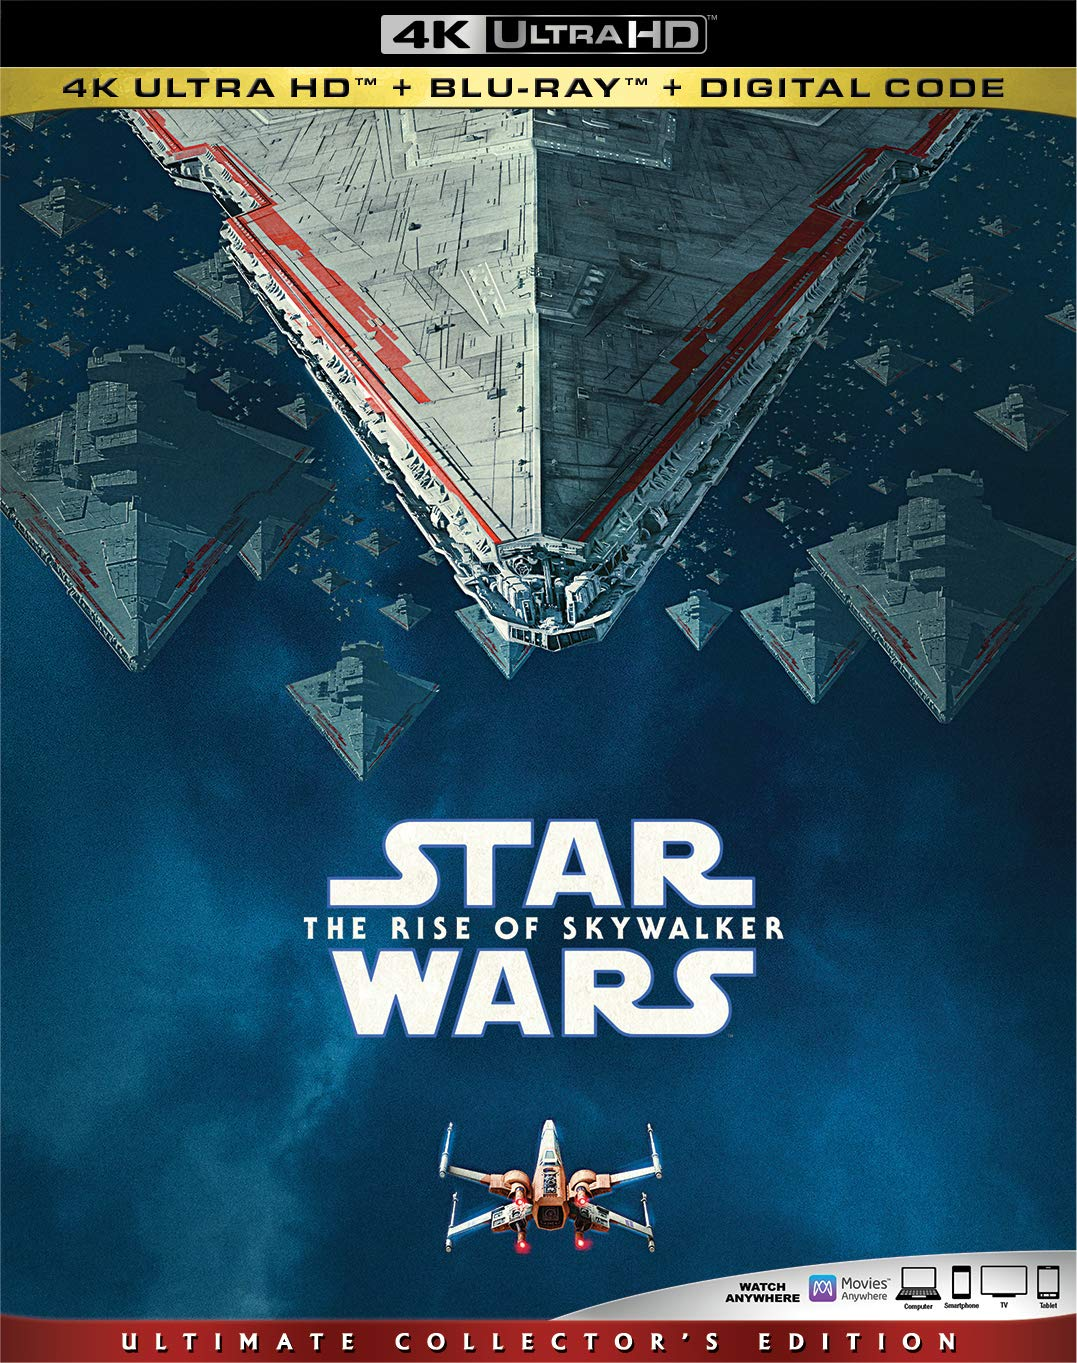 Star Wars: The Rise of Skywalker 4K Blu Ray